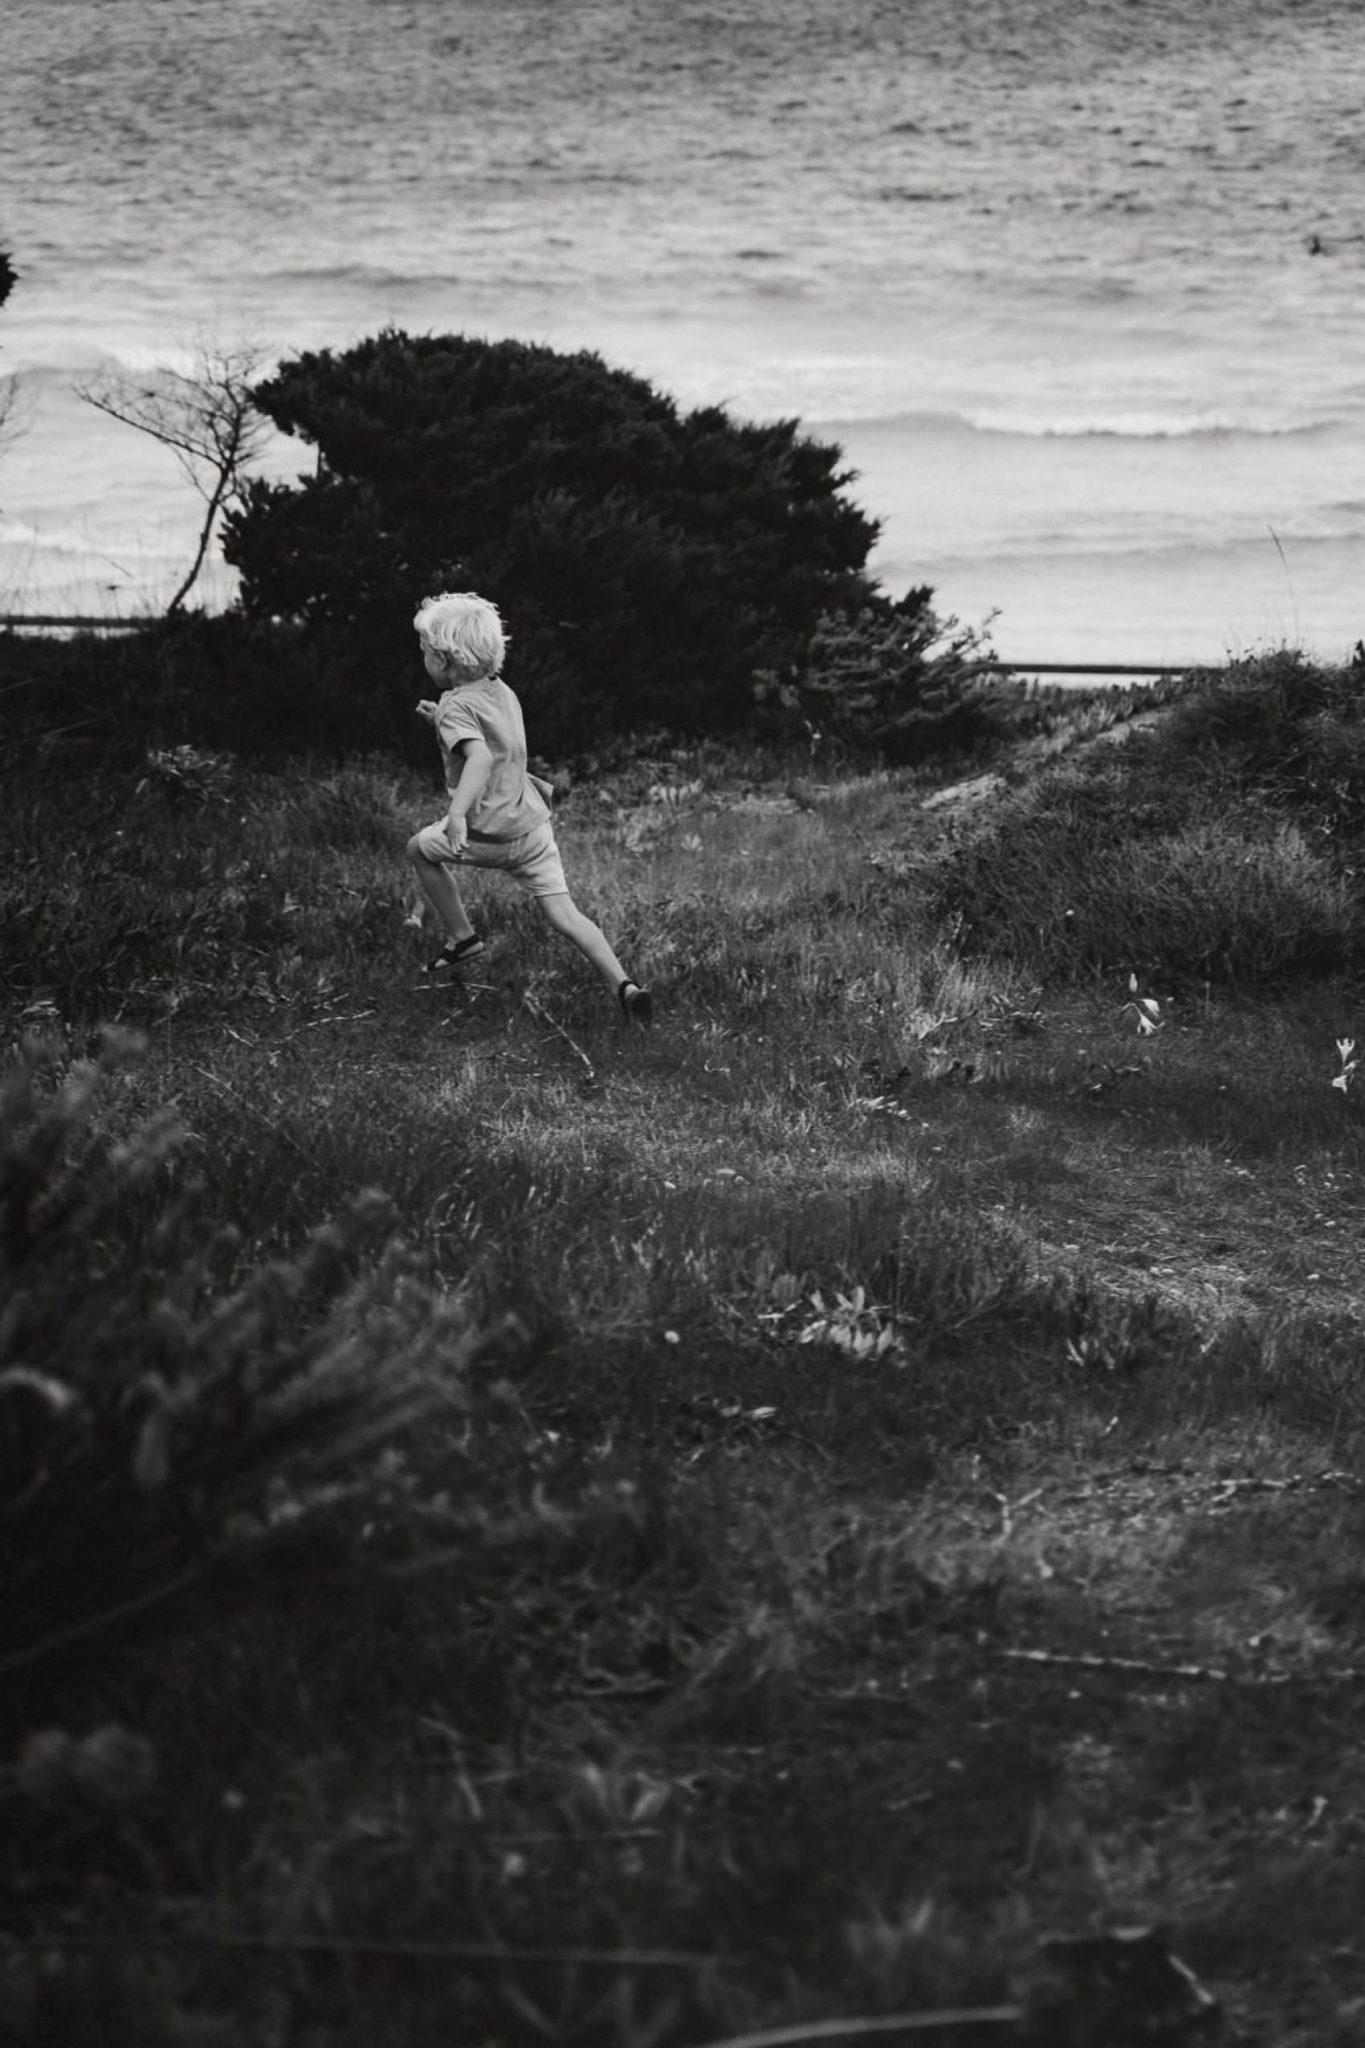 bambino che corre Stintino